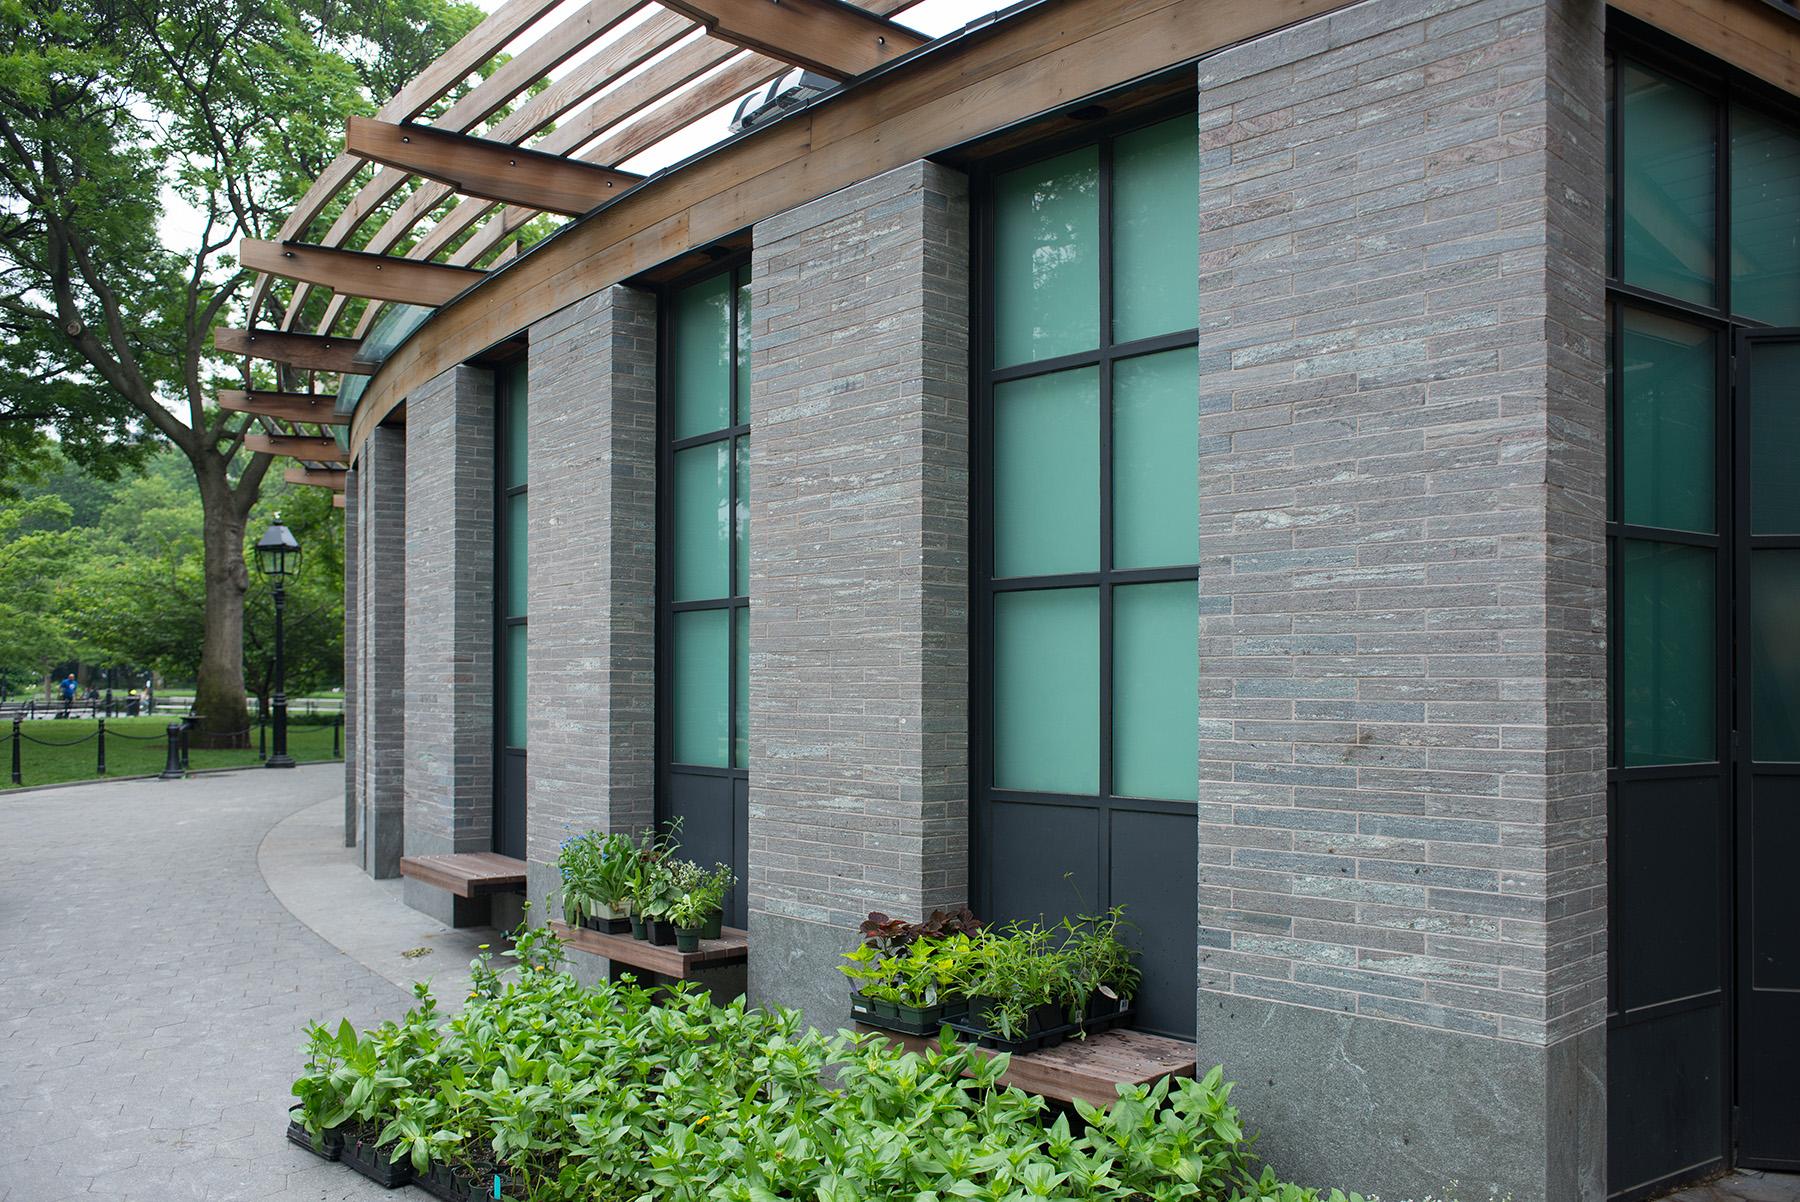 sidewalk plants and building